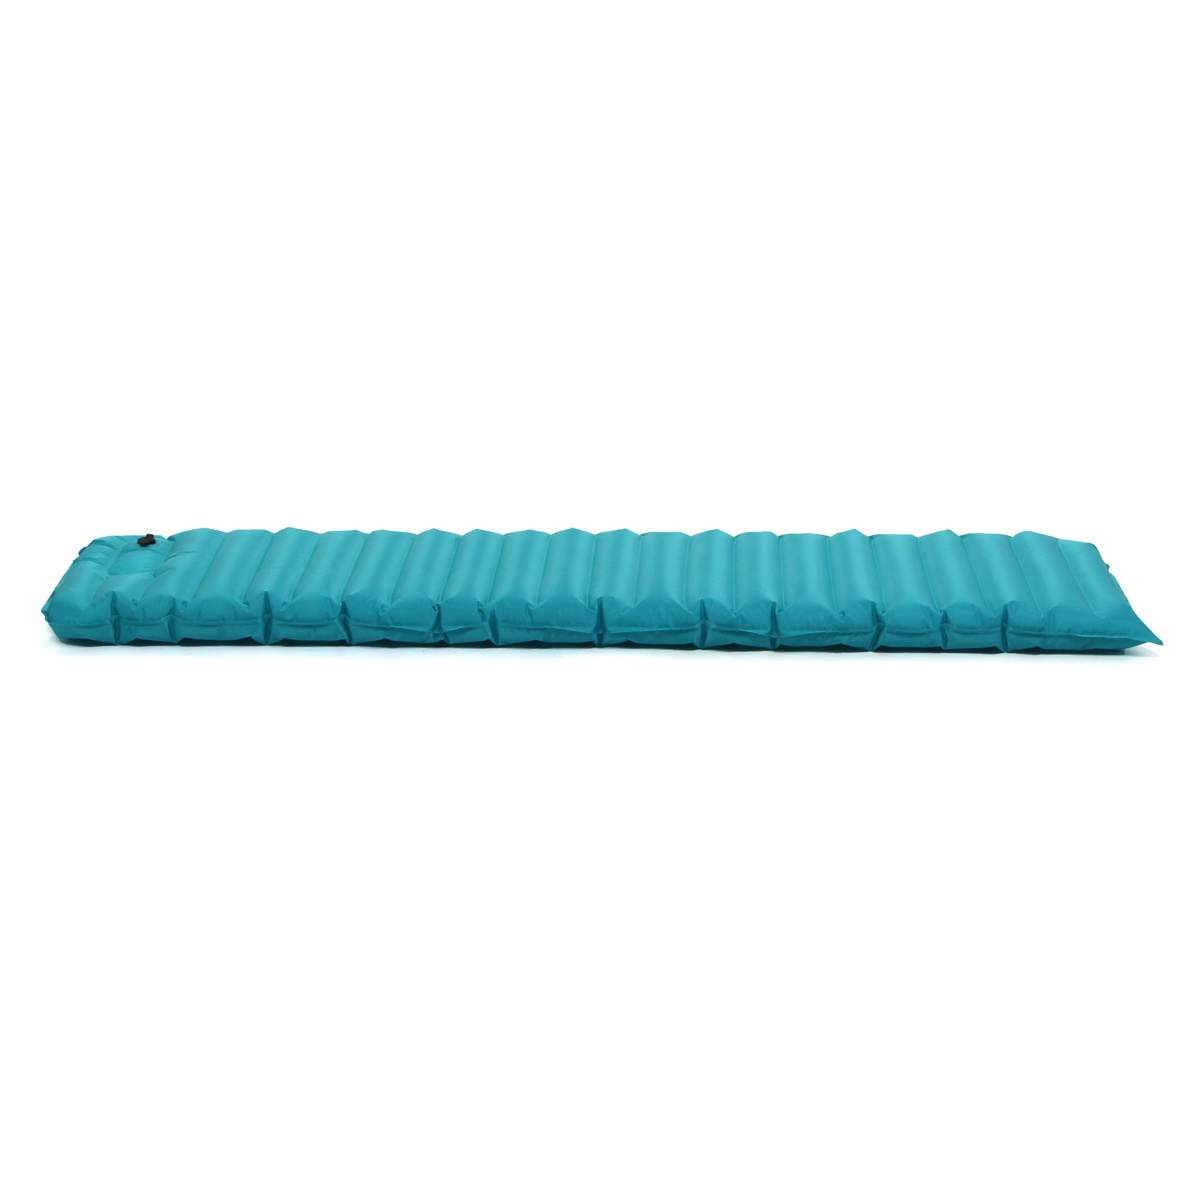 Large Size Air Core Tube Camping Sleeping Pad